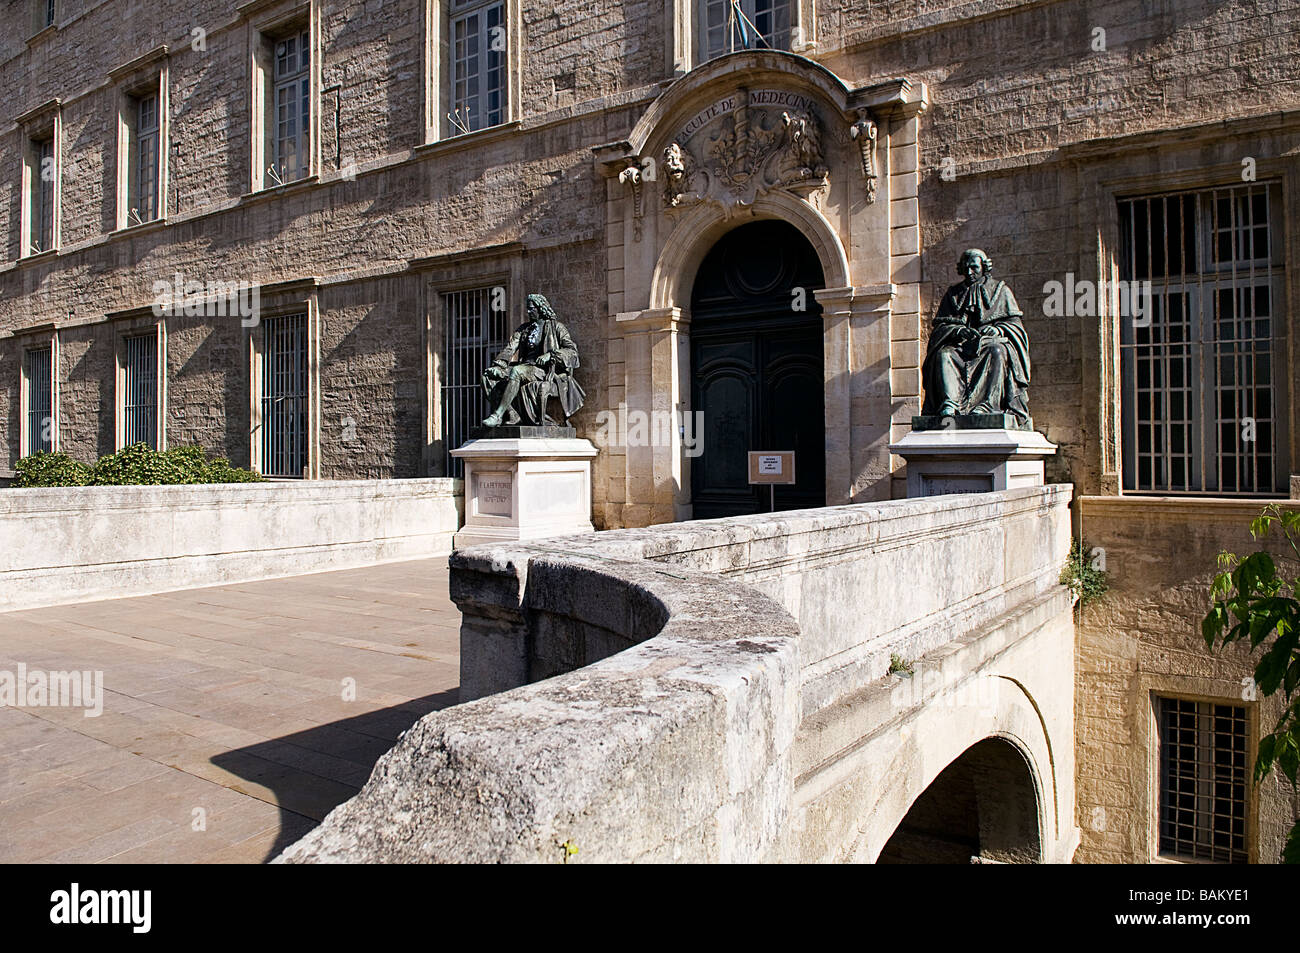 France, Herault, Montpellier, Medical school - Stock Image